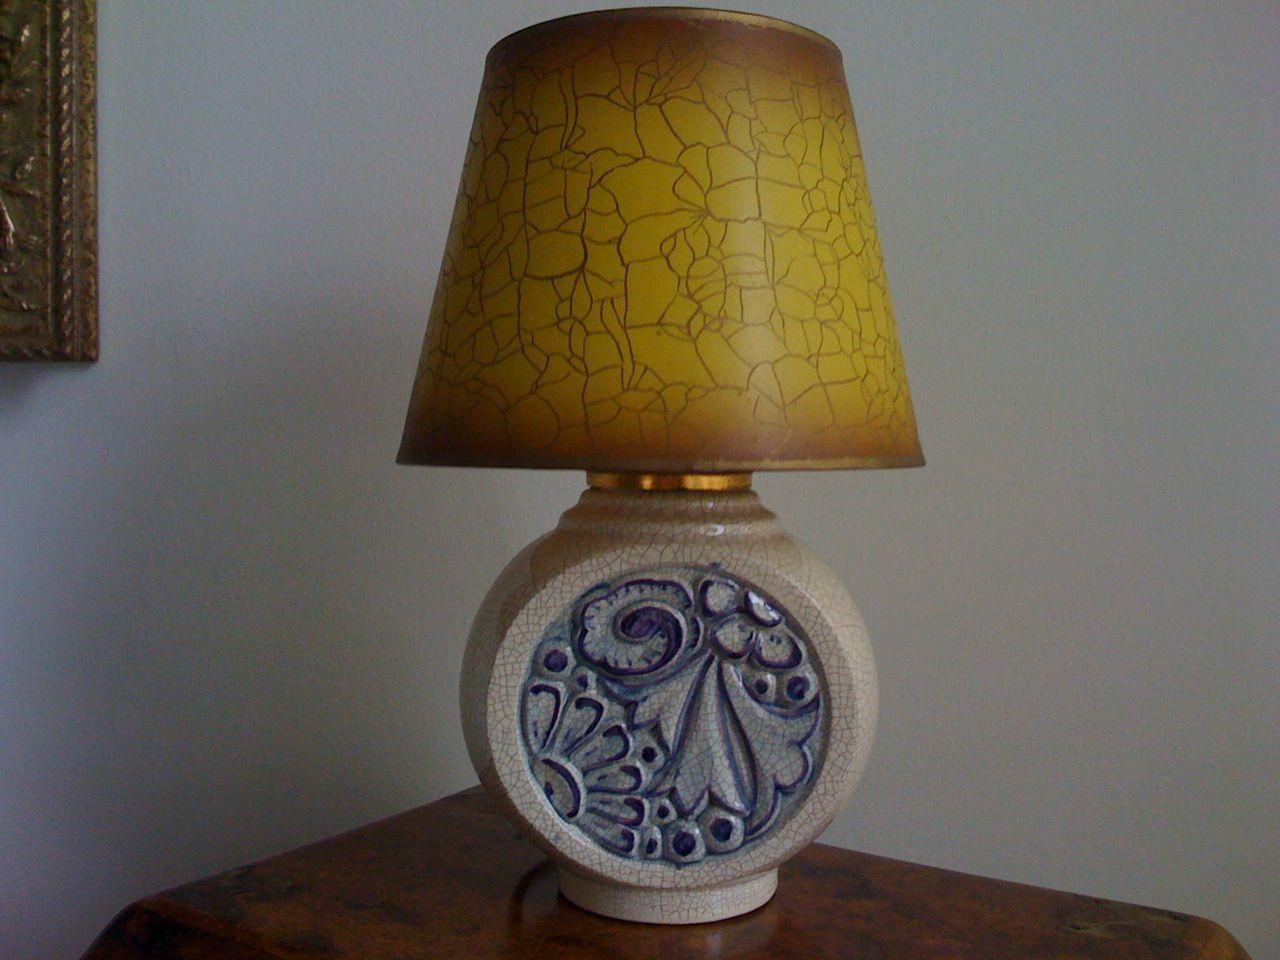 Pied De Lampe Ceramique Craquelee Art Deco Le Blog De La Chineuse